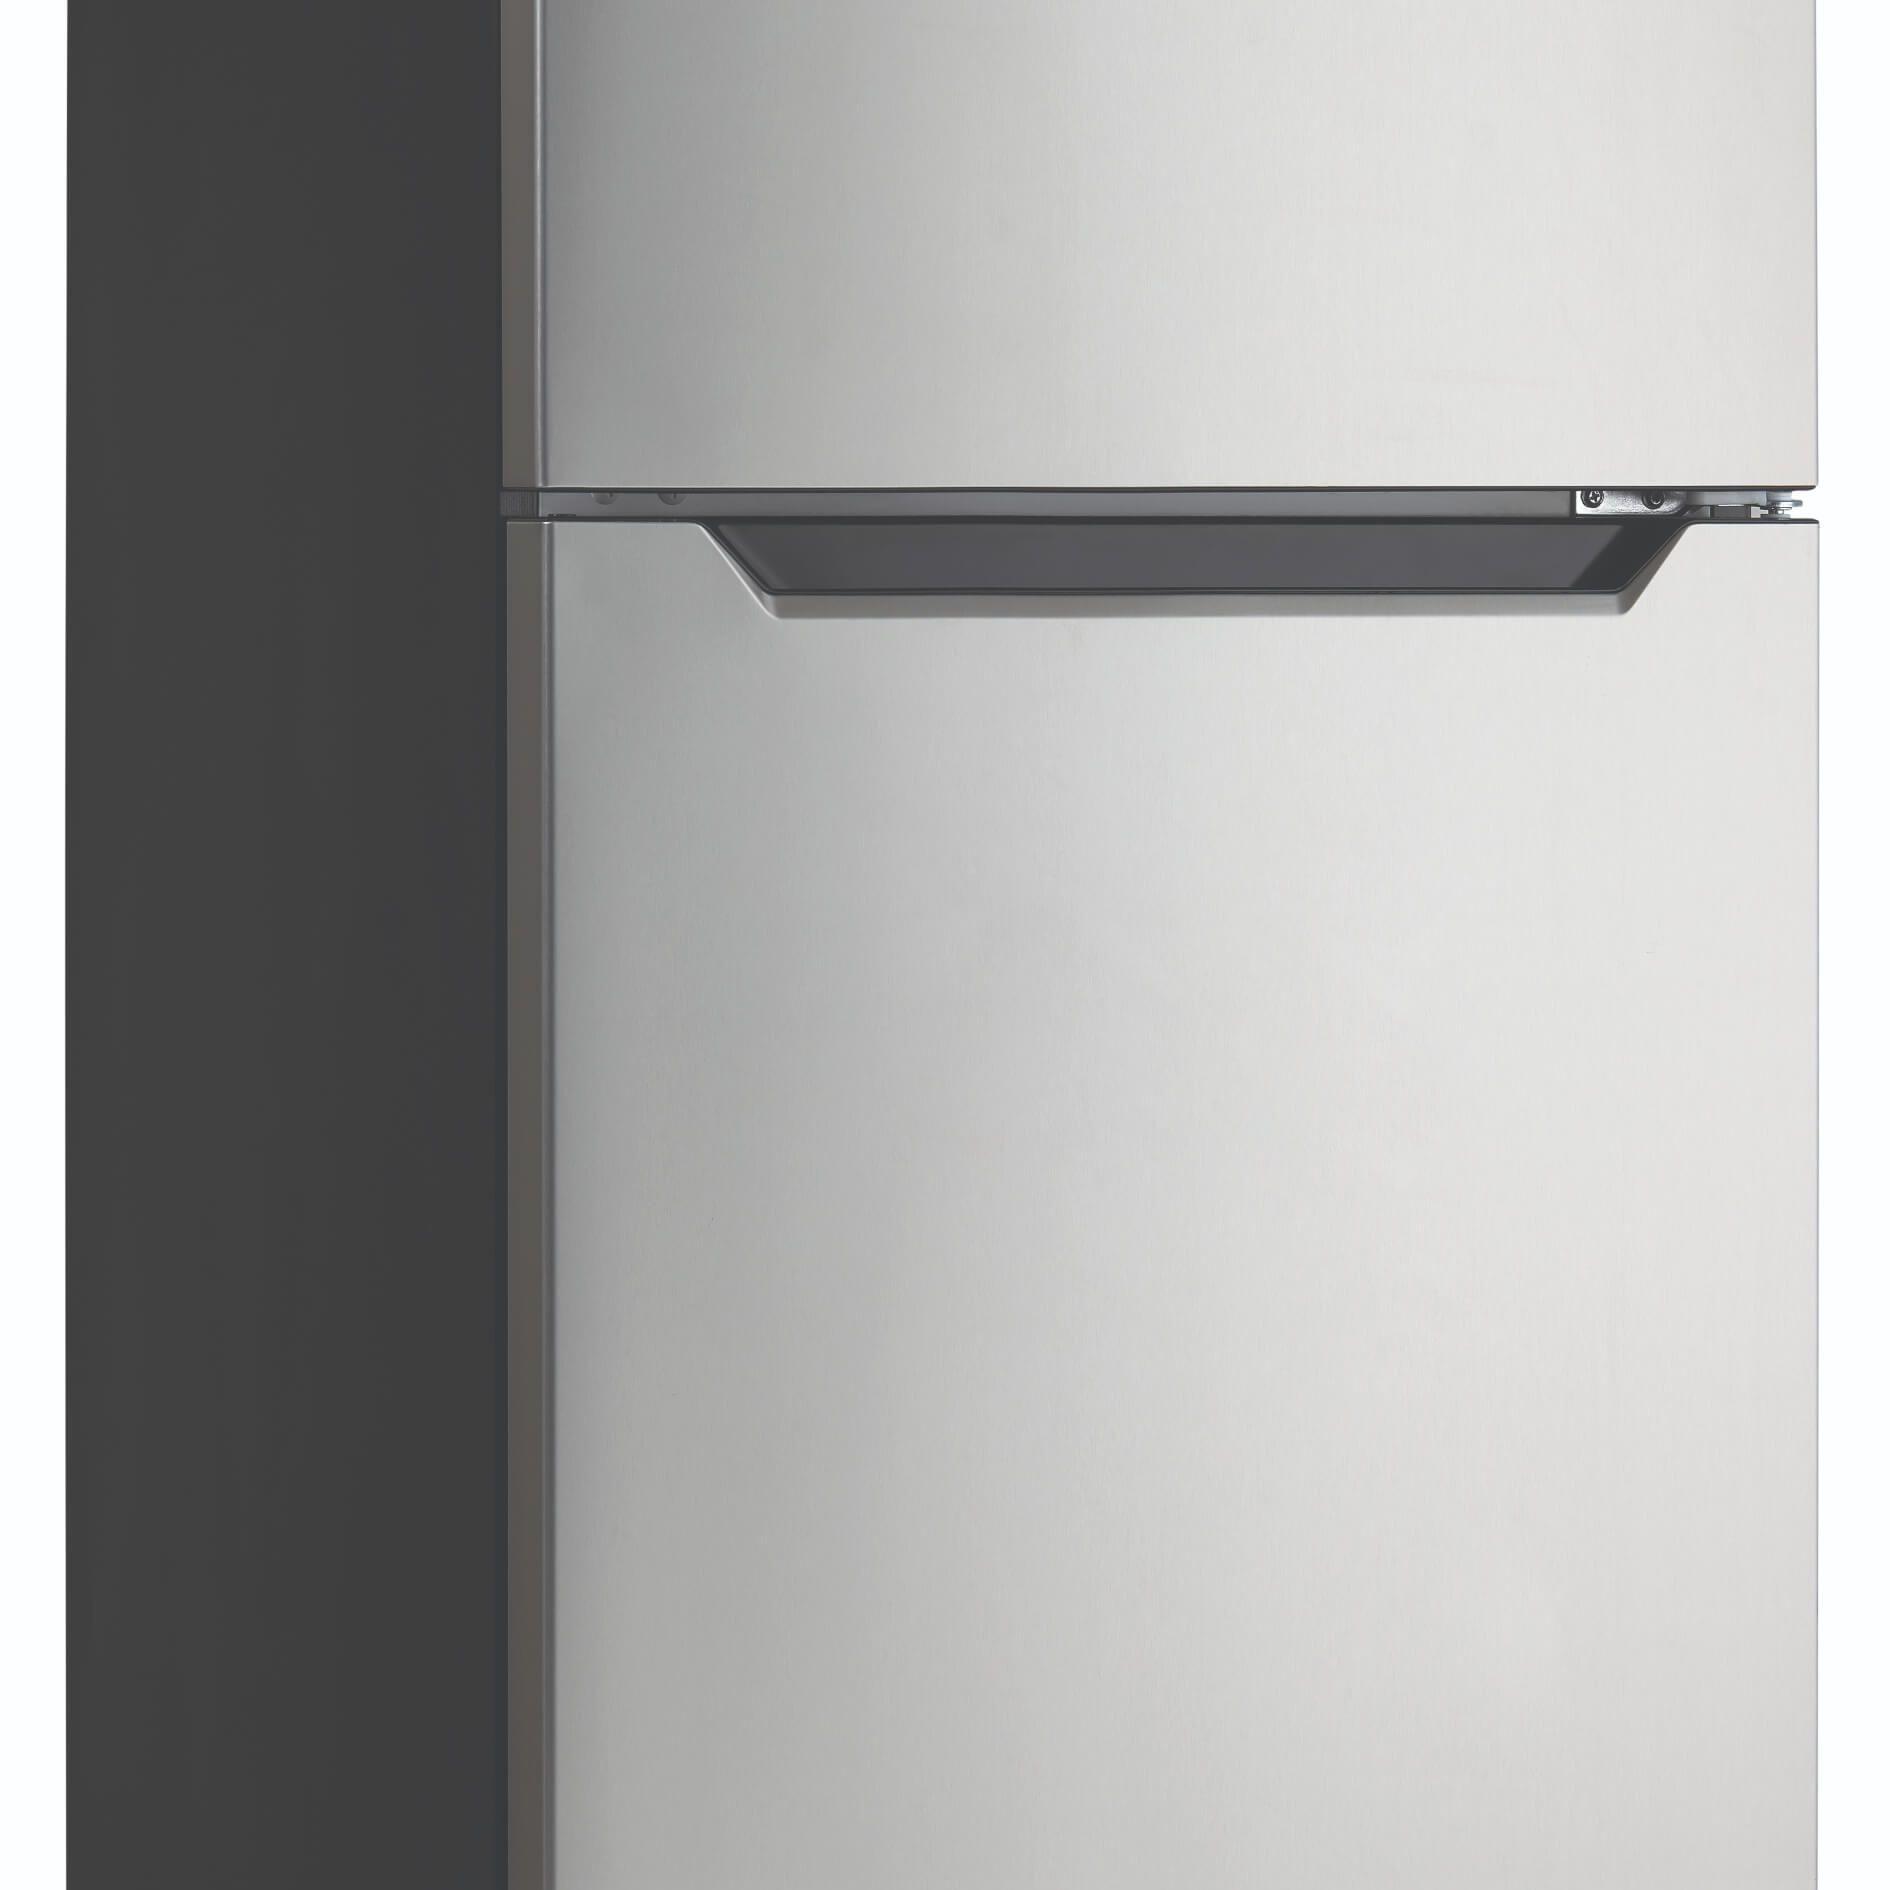 danby-top-freezer-refrigerator-stainless-steel